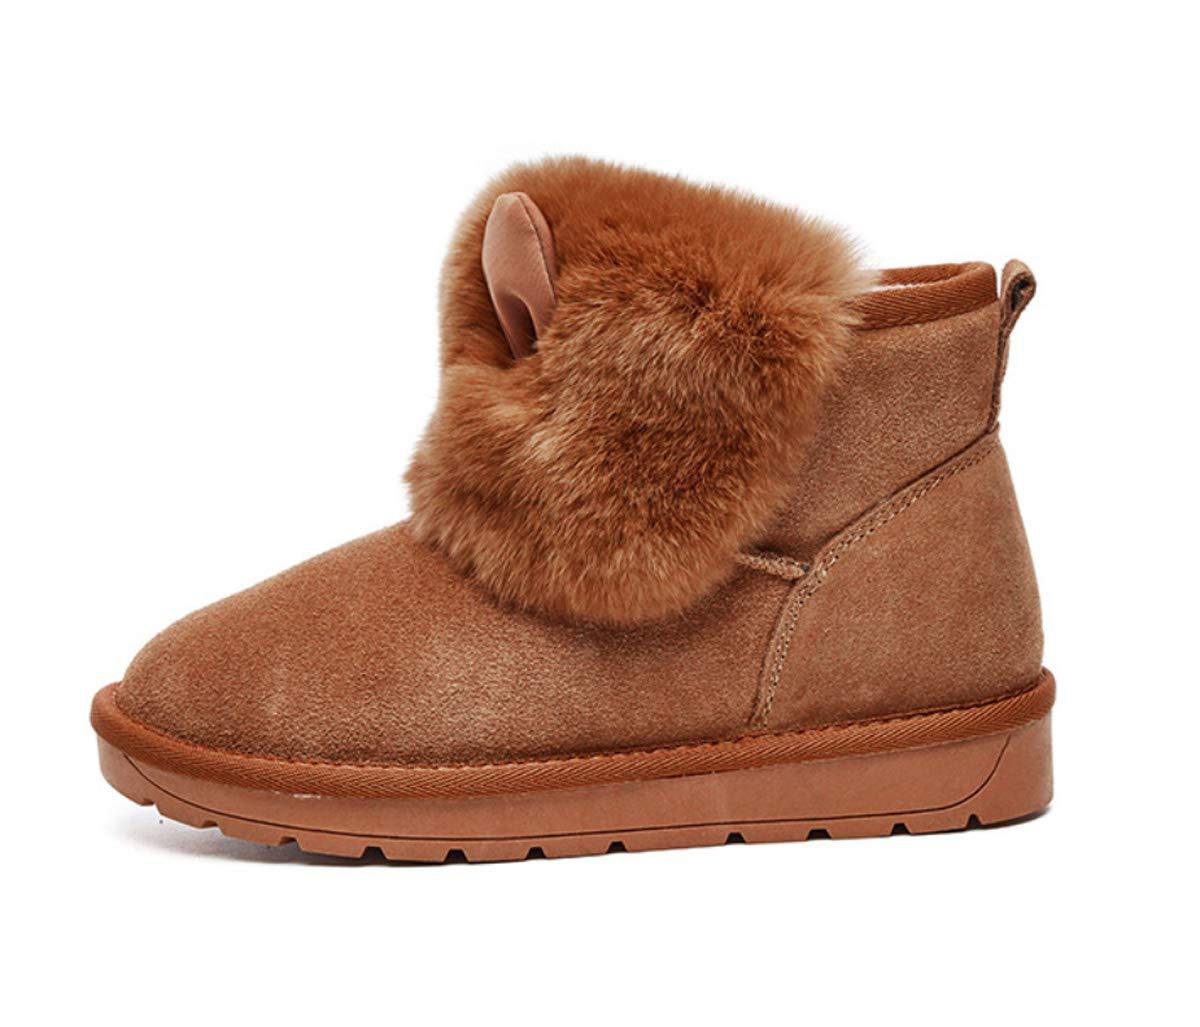 DANDANJIE Damenschuhe Winter Niedliche Schneeschuhe Flache Ferse Runde Runde Runde Zehe Cartoon Ankle Stiefelies 2f94c4